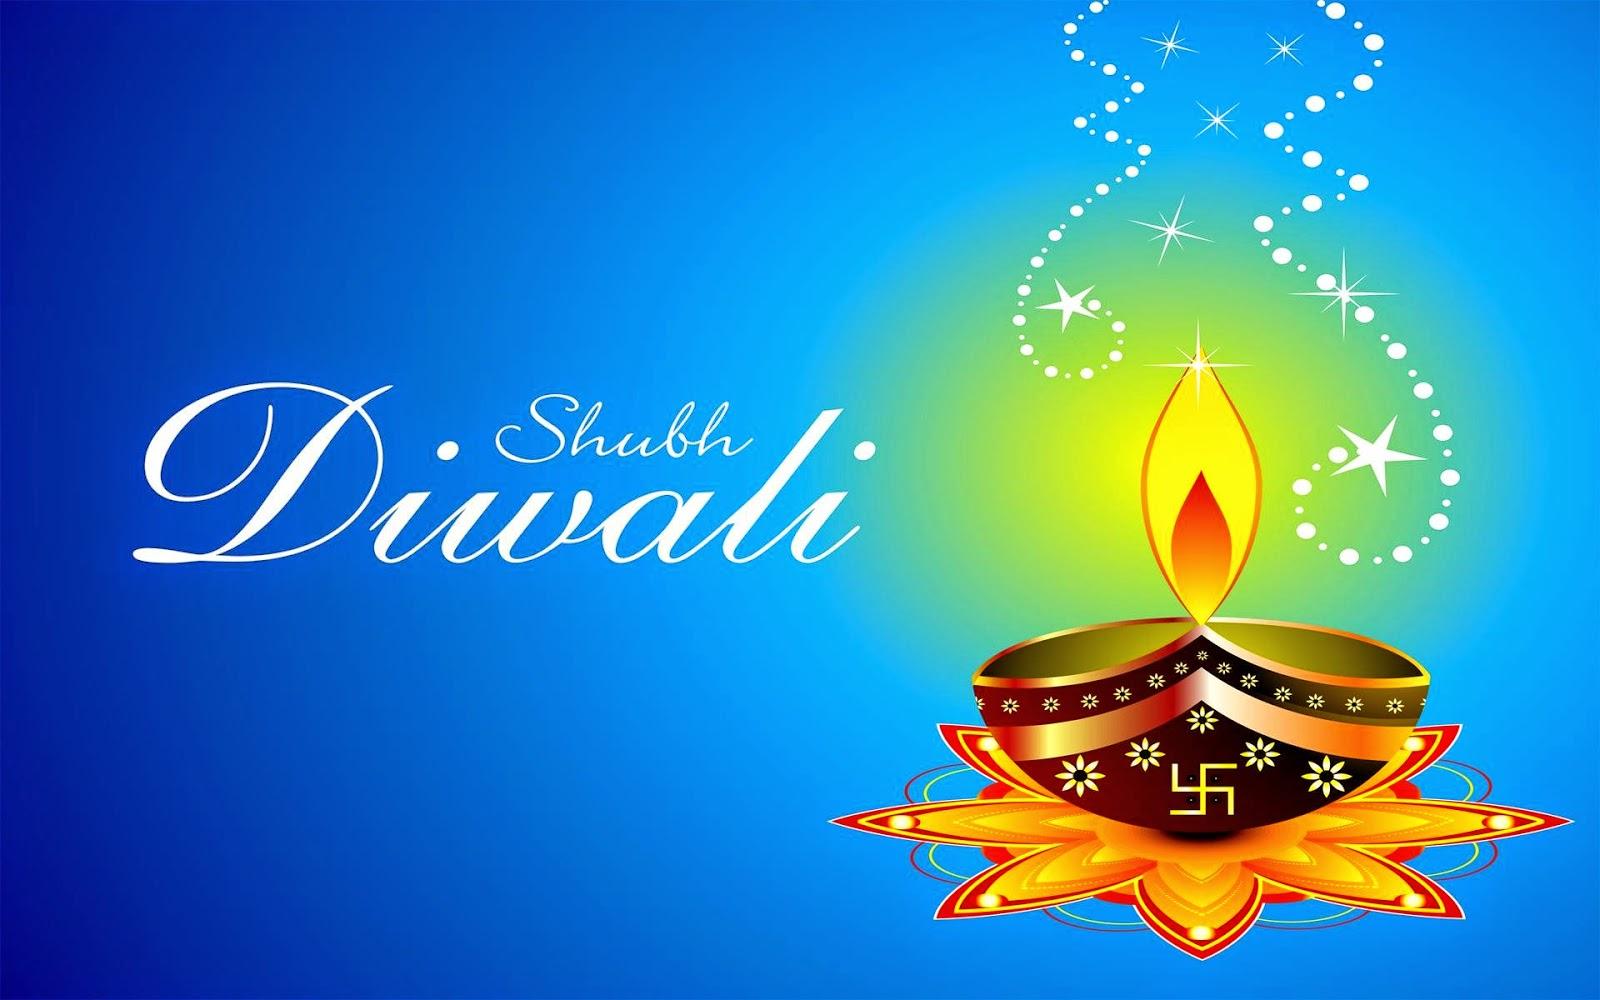 Happy diwali wishes 2016 rangoli designs essay poems sms 9 happy diwali wallpapers 2014 kristyandbryce Gallery